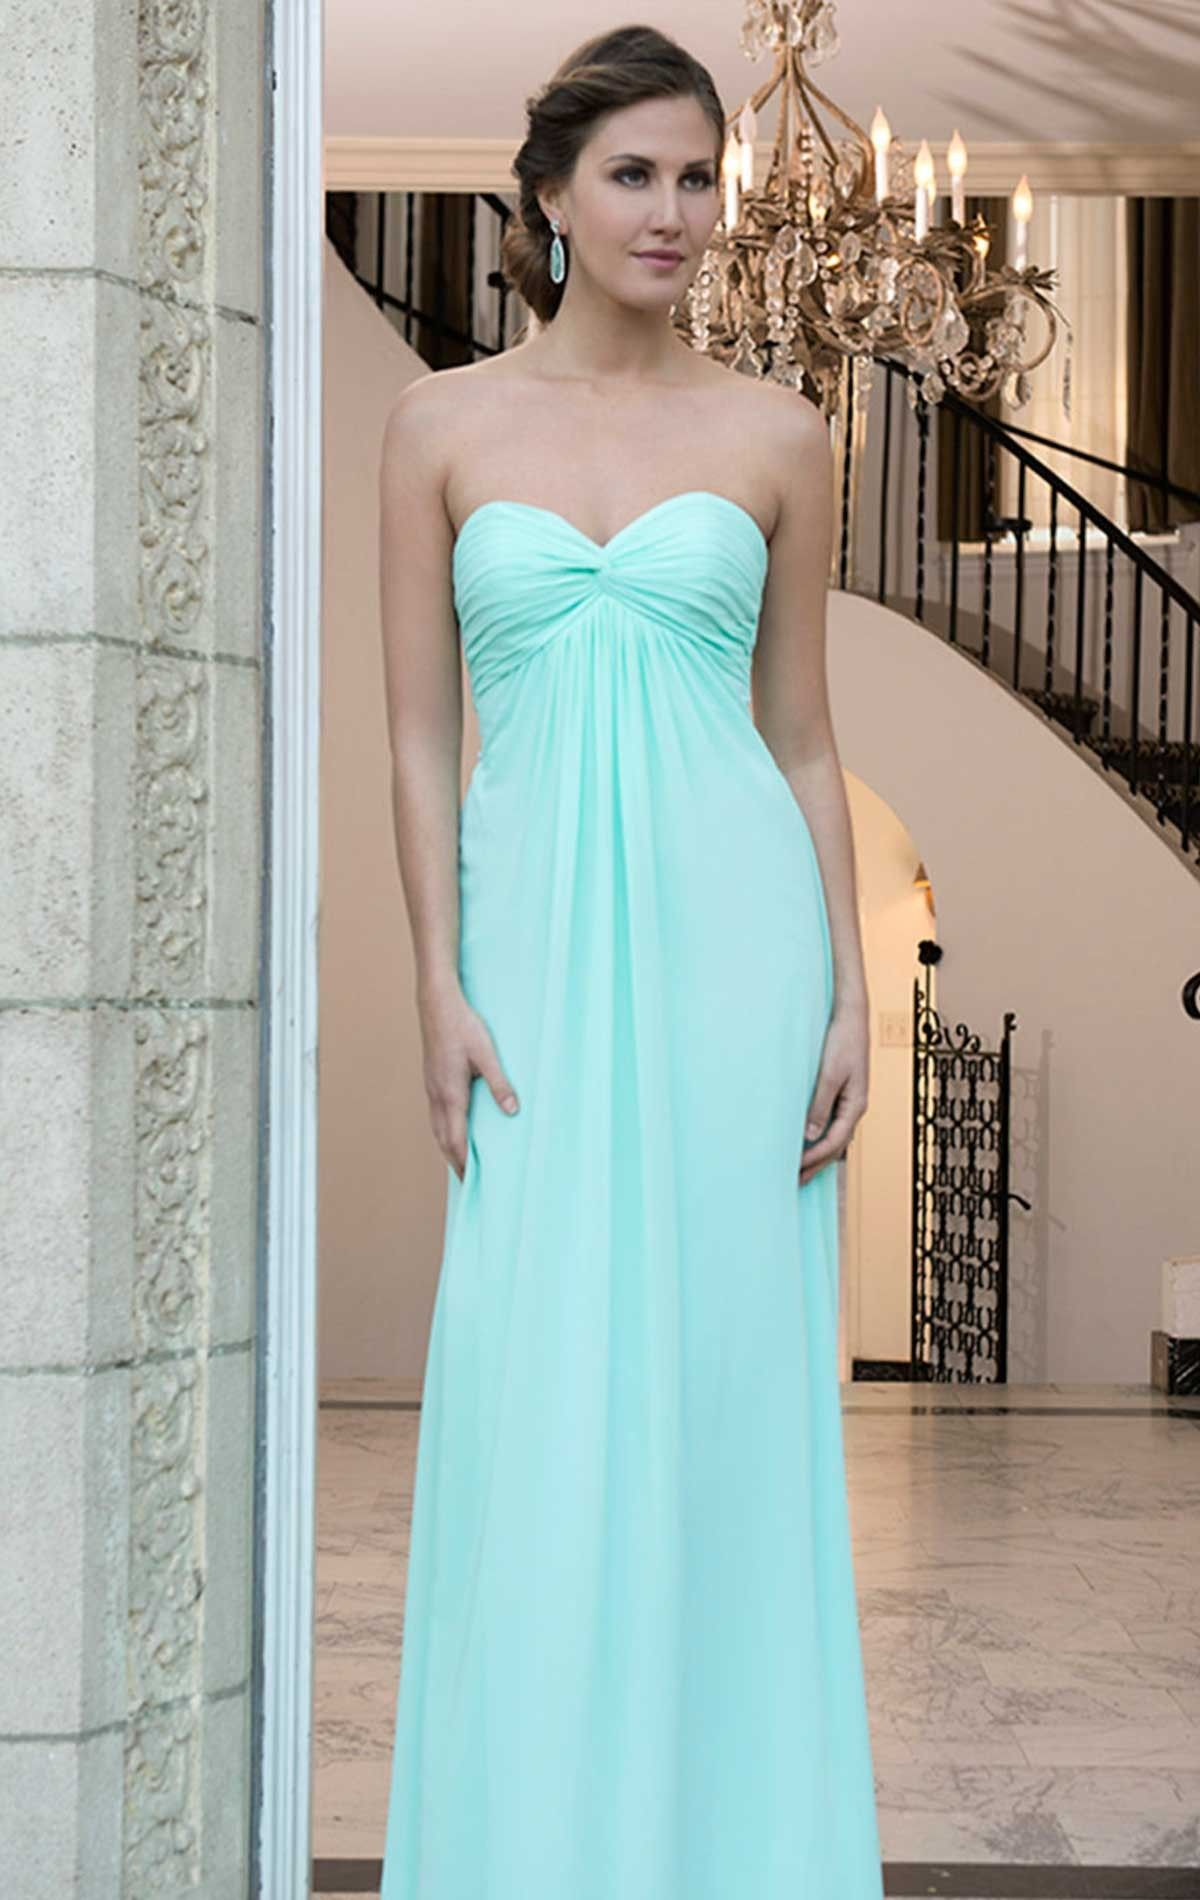 Bm2075 bridesmaid dress bm2075 ice mint green chiffon